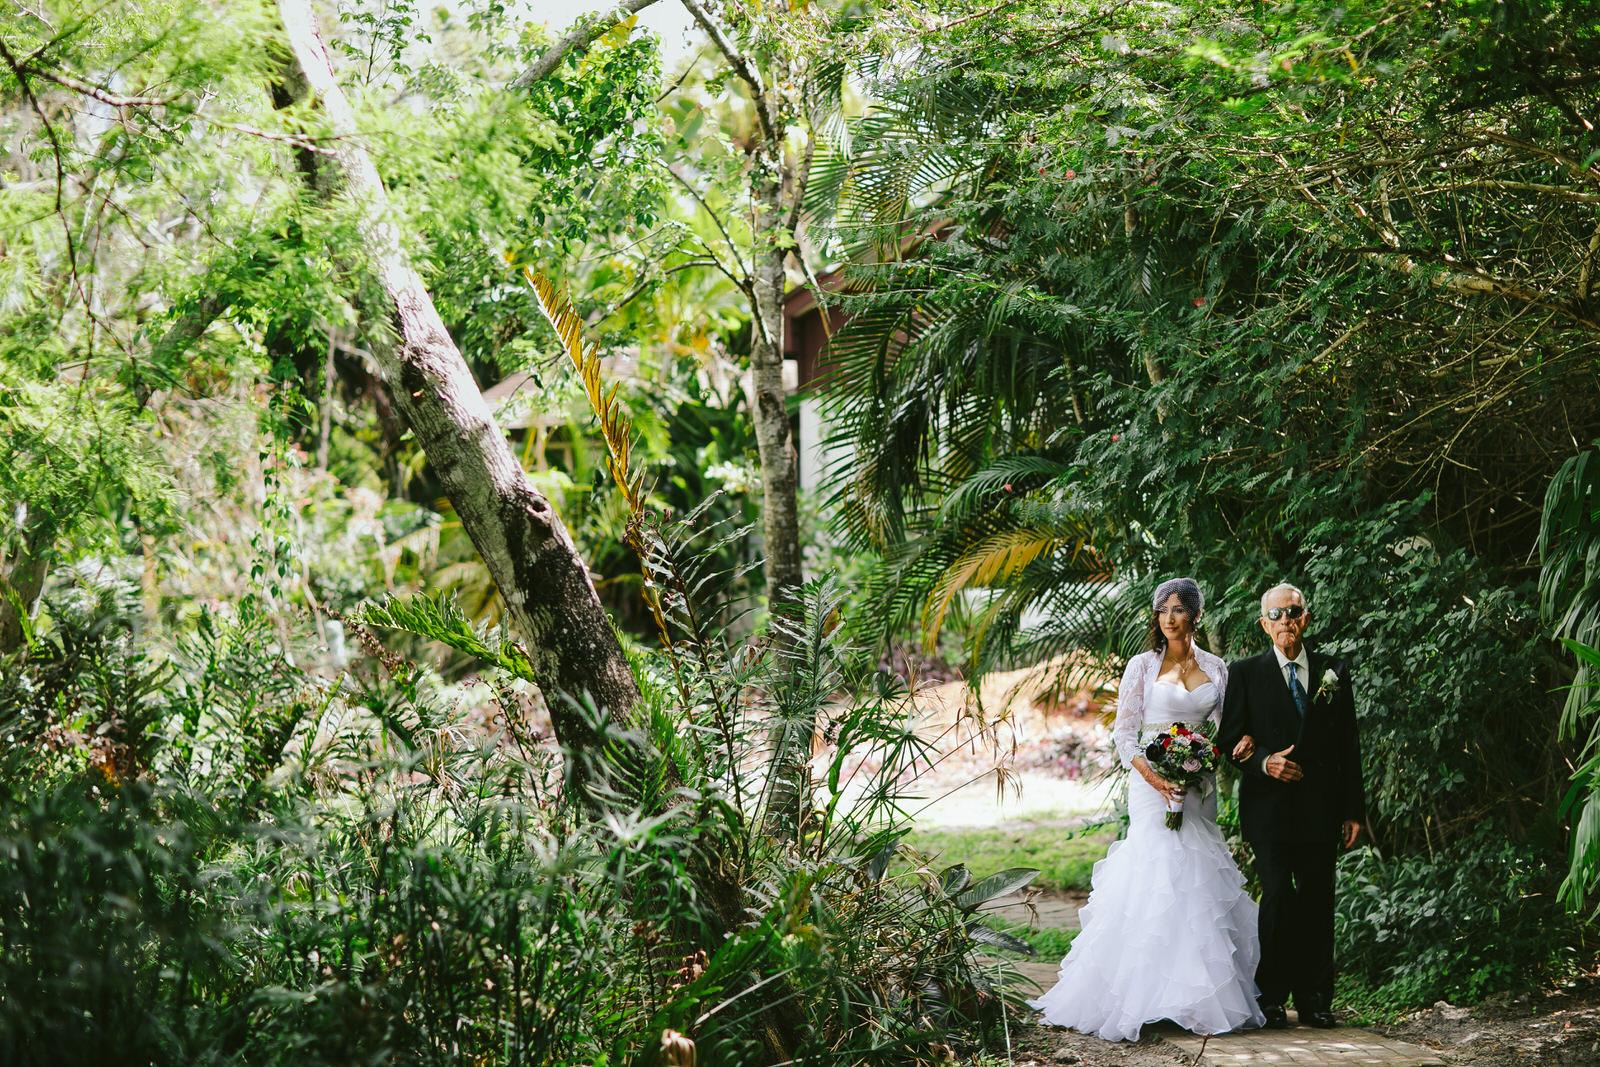 kashi-ashram-wedding-sebastian-florida-tiny-house-photo-400.jpg